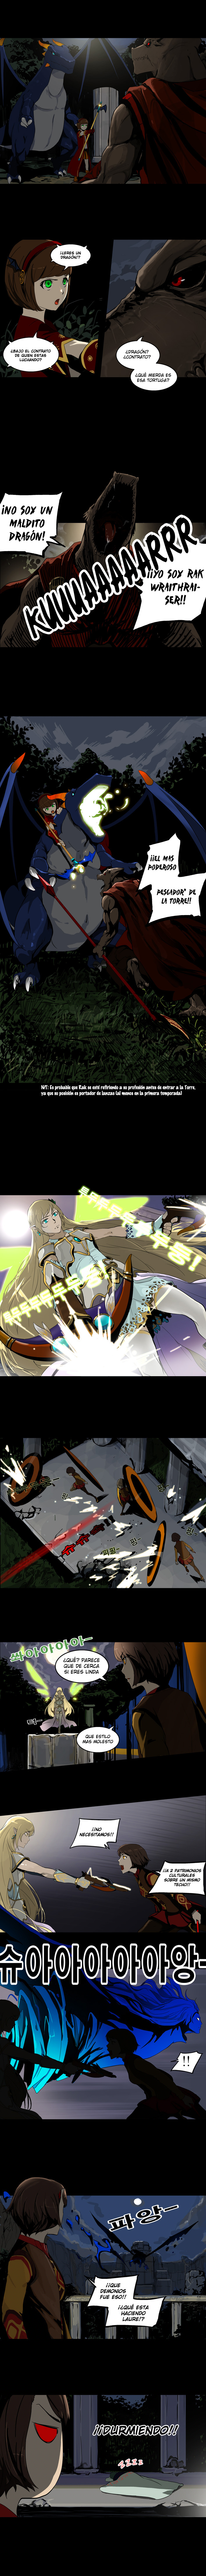 http://c5.ninemanga.com/es_manga/21/149/424360/6a7b6d66dba243496835d7fe2277b84d.jpg Page 2